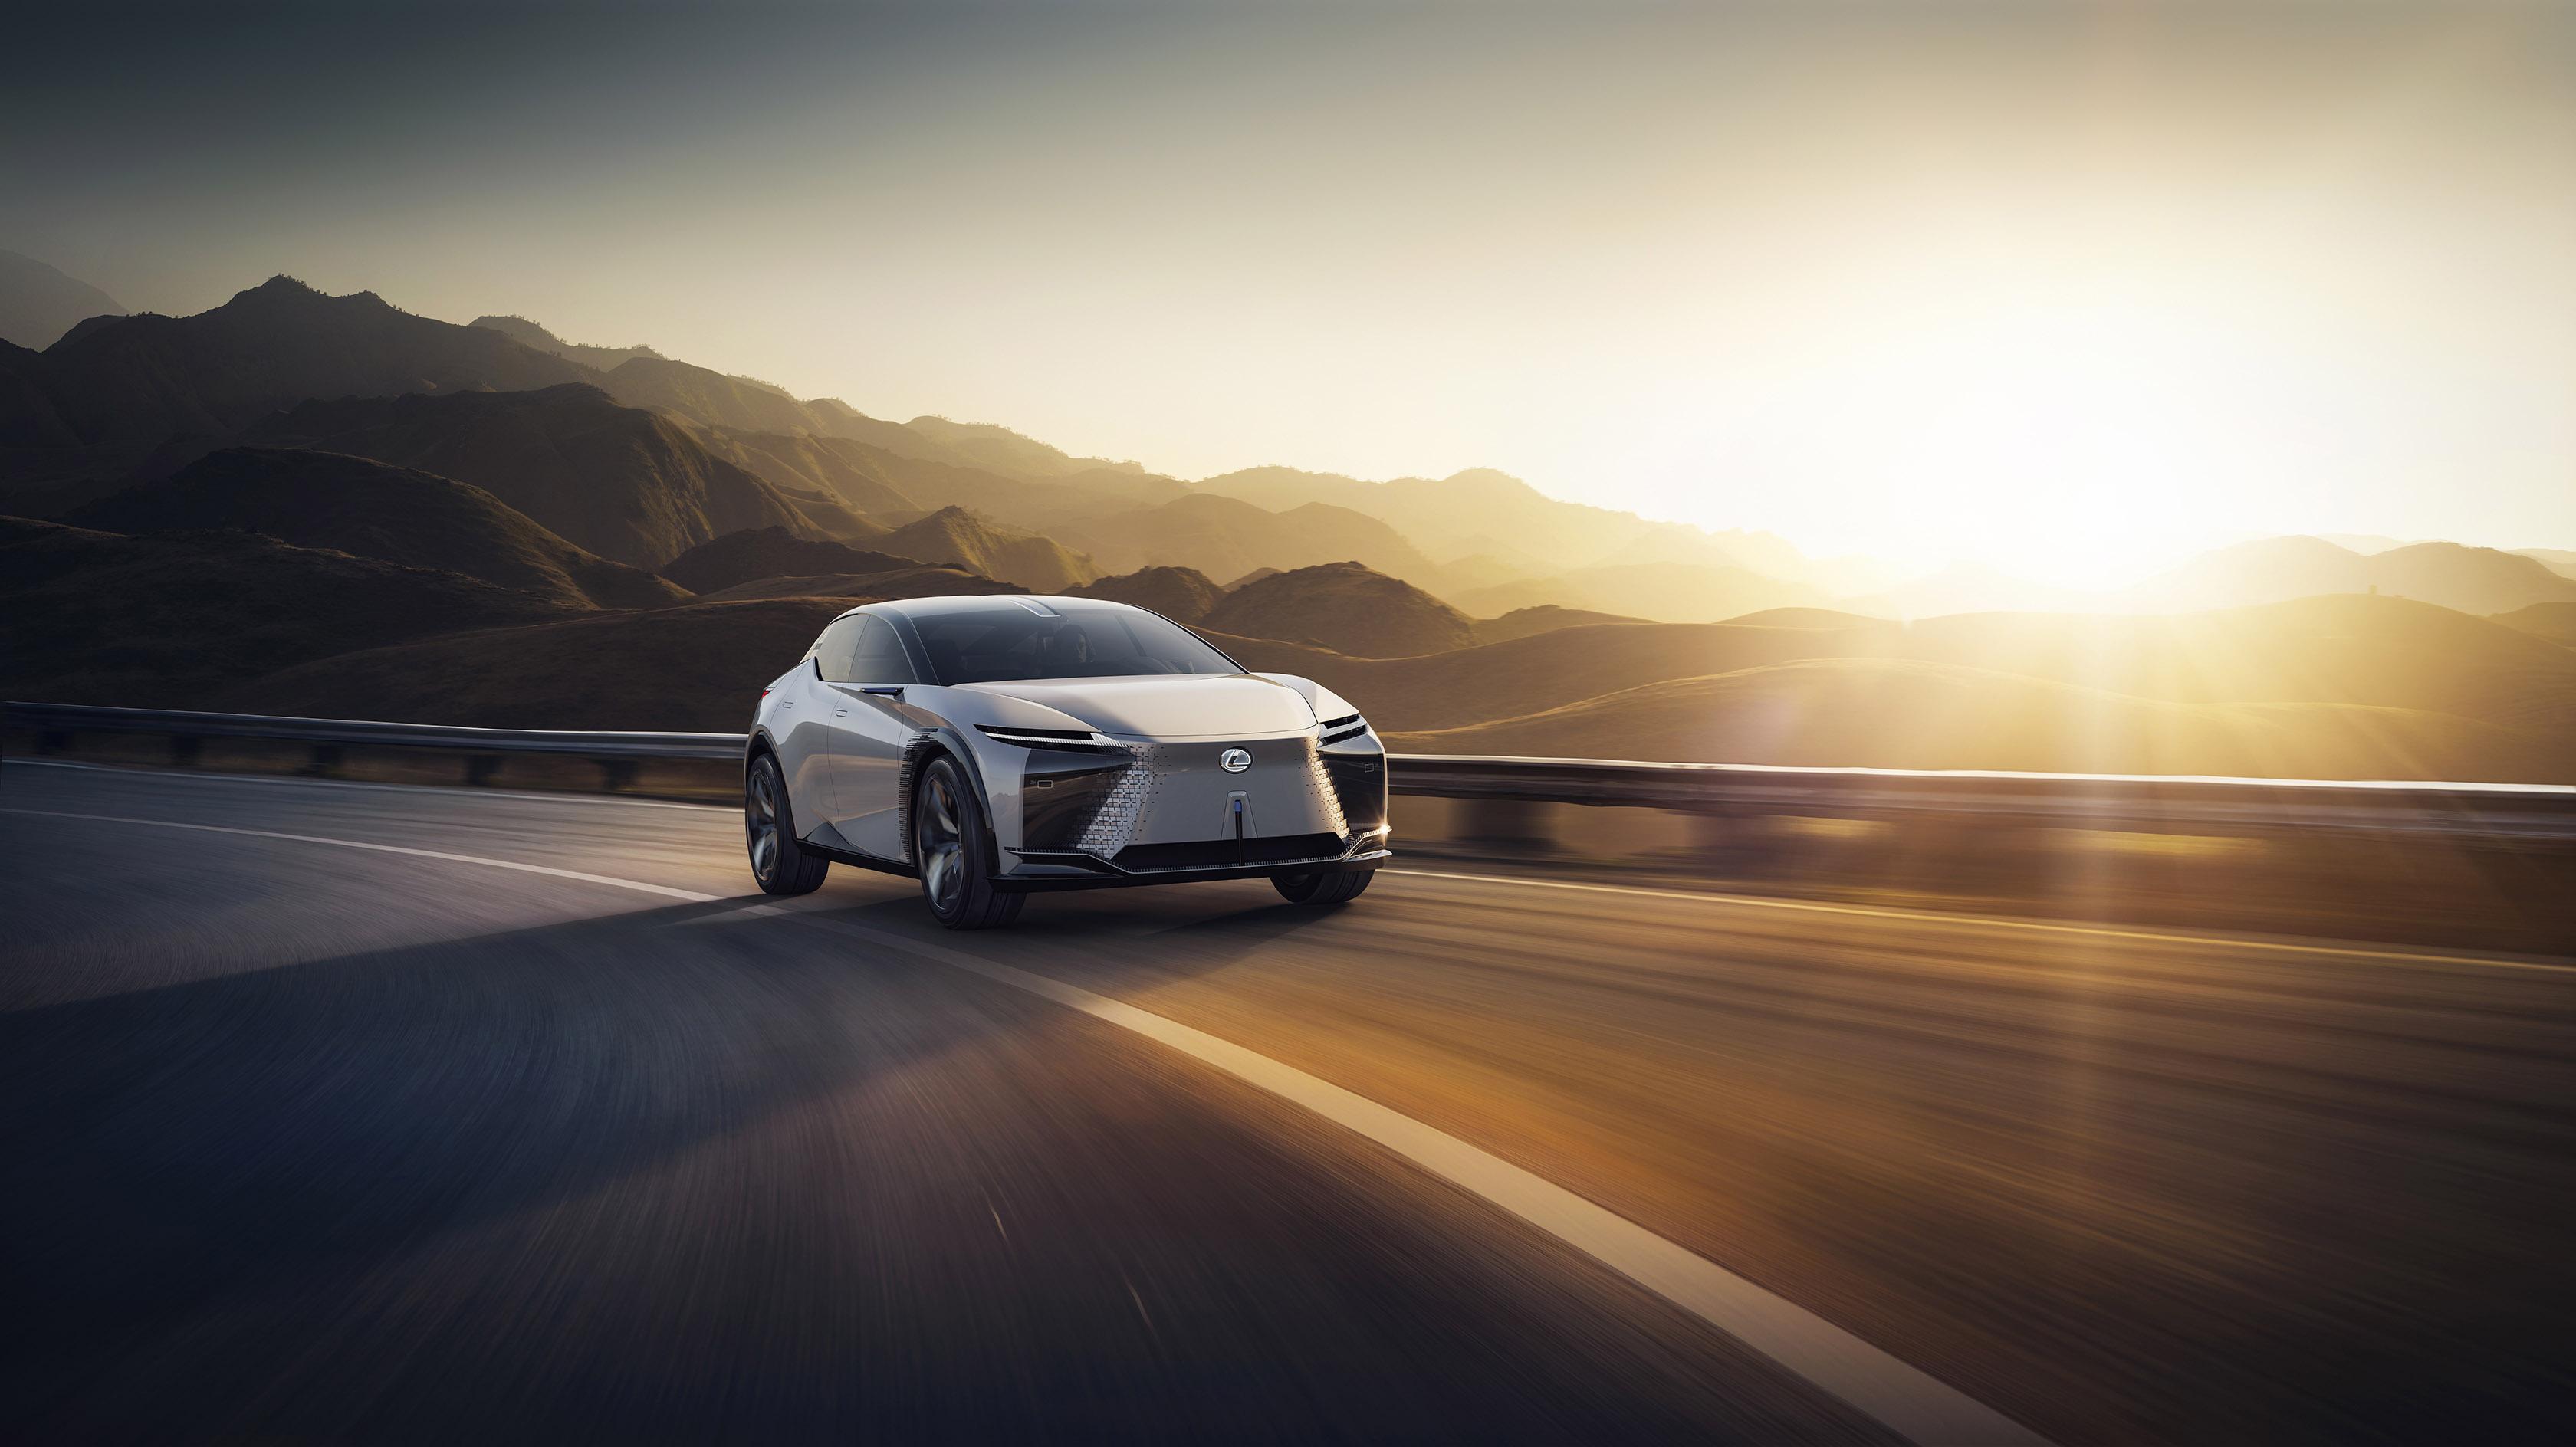 11-Lexus-LF-Z-Electrified